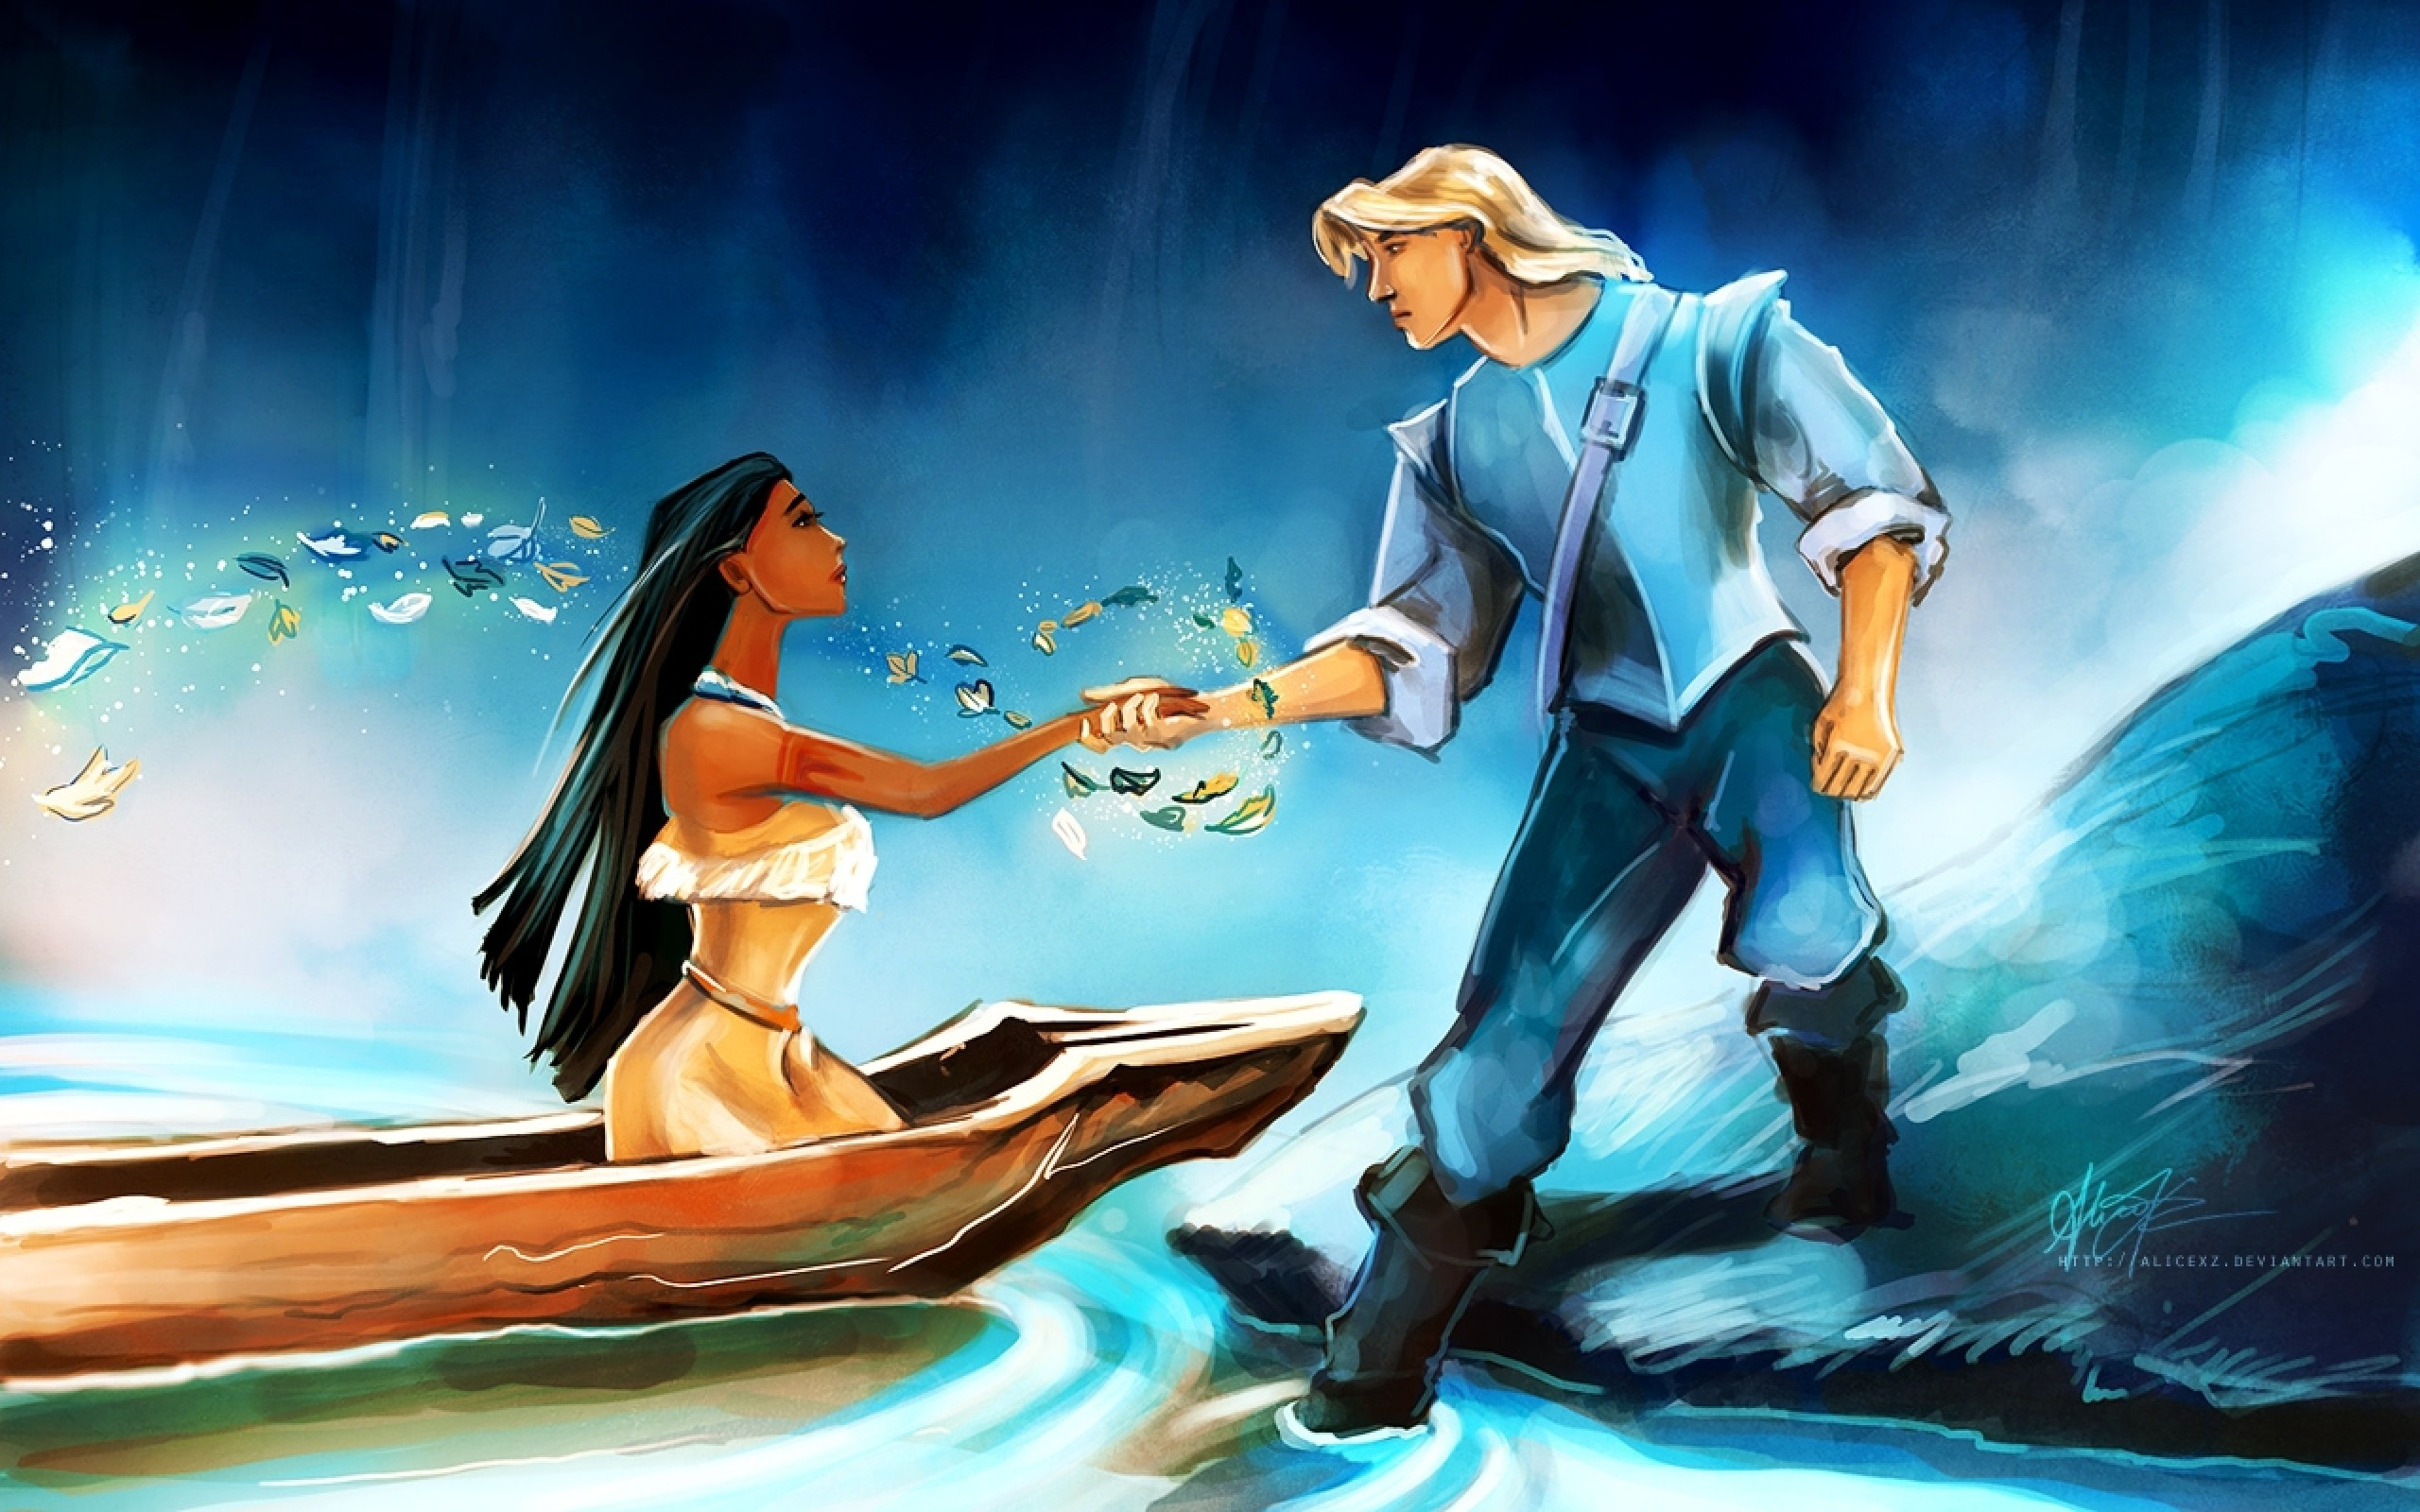 Res: 2560x1600, Pocahontas Wallpapers